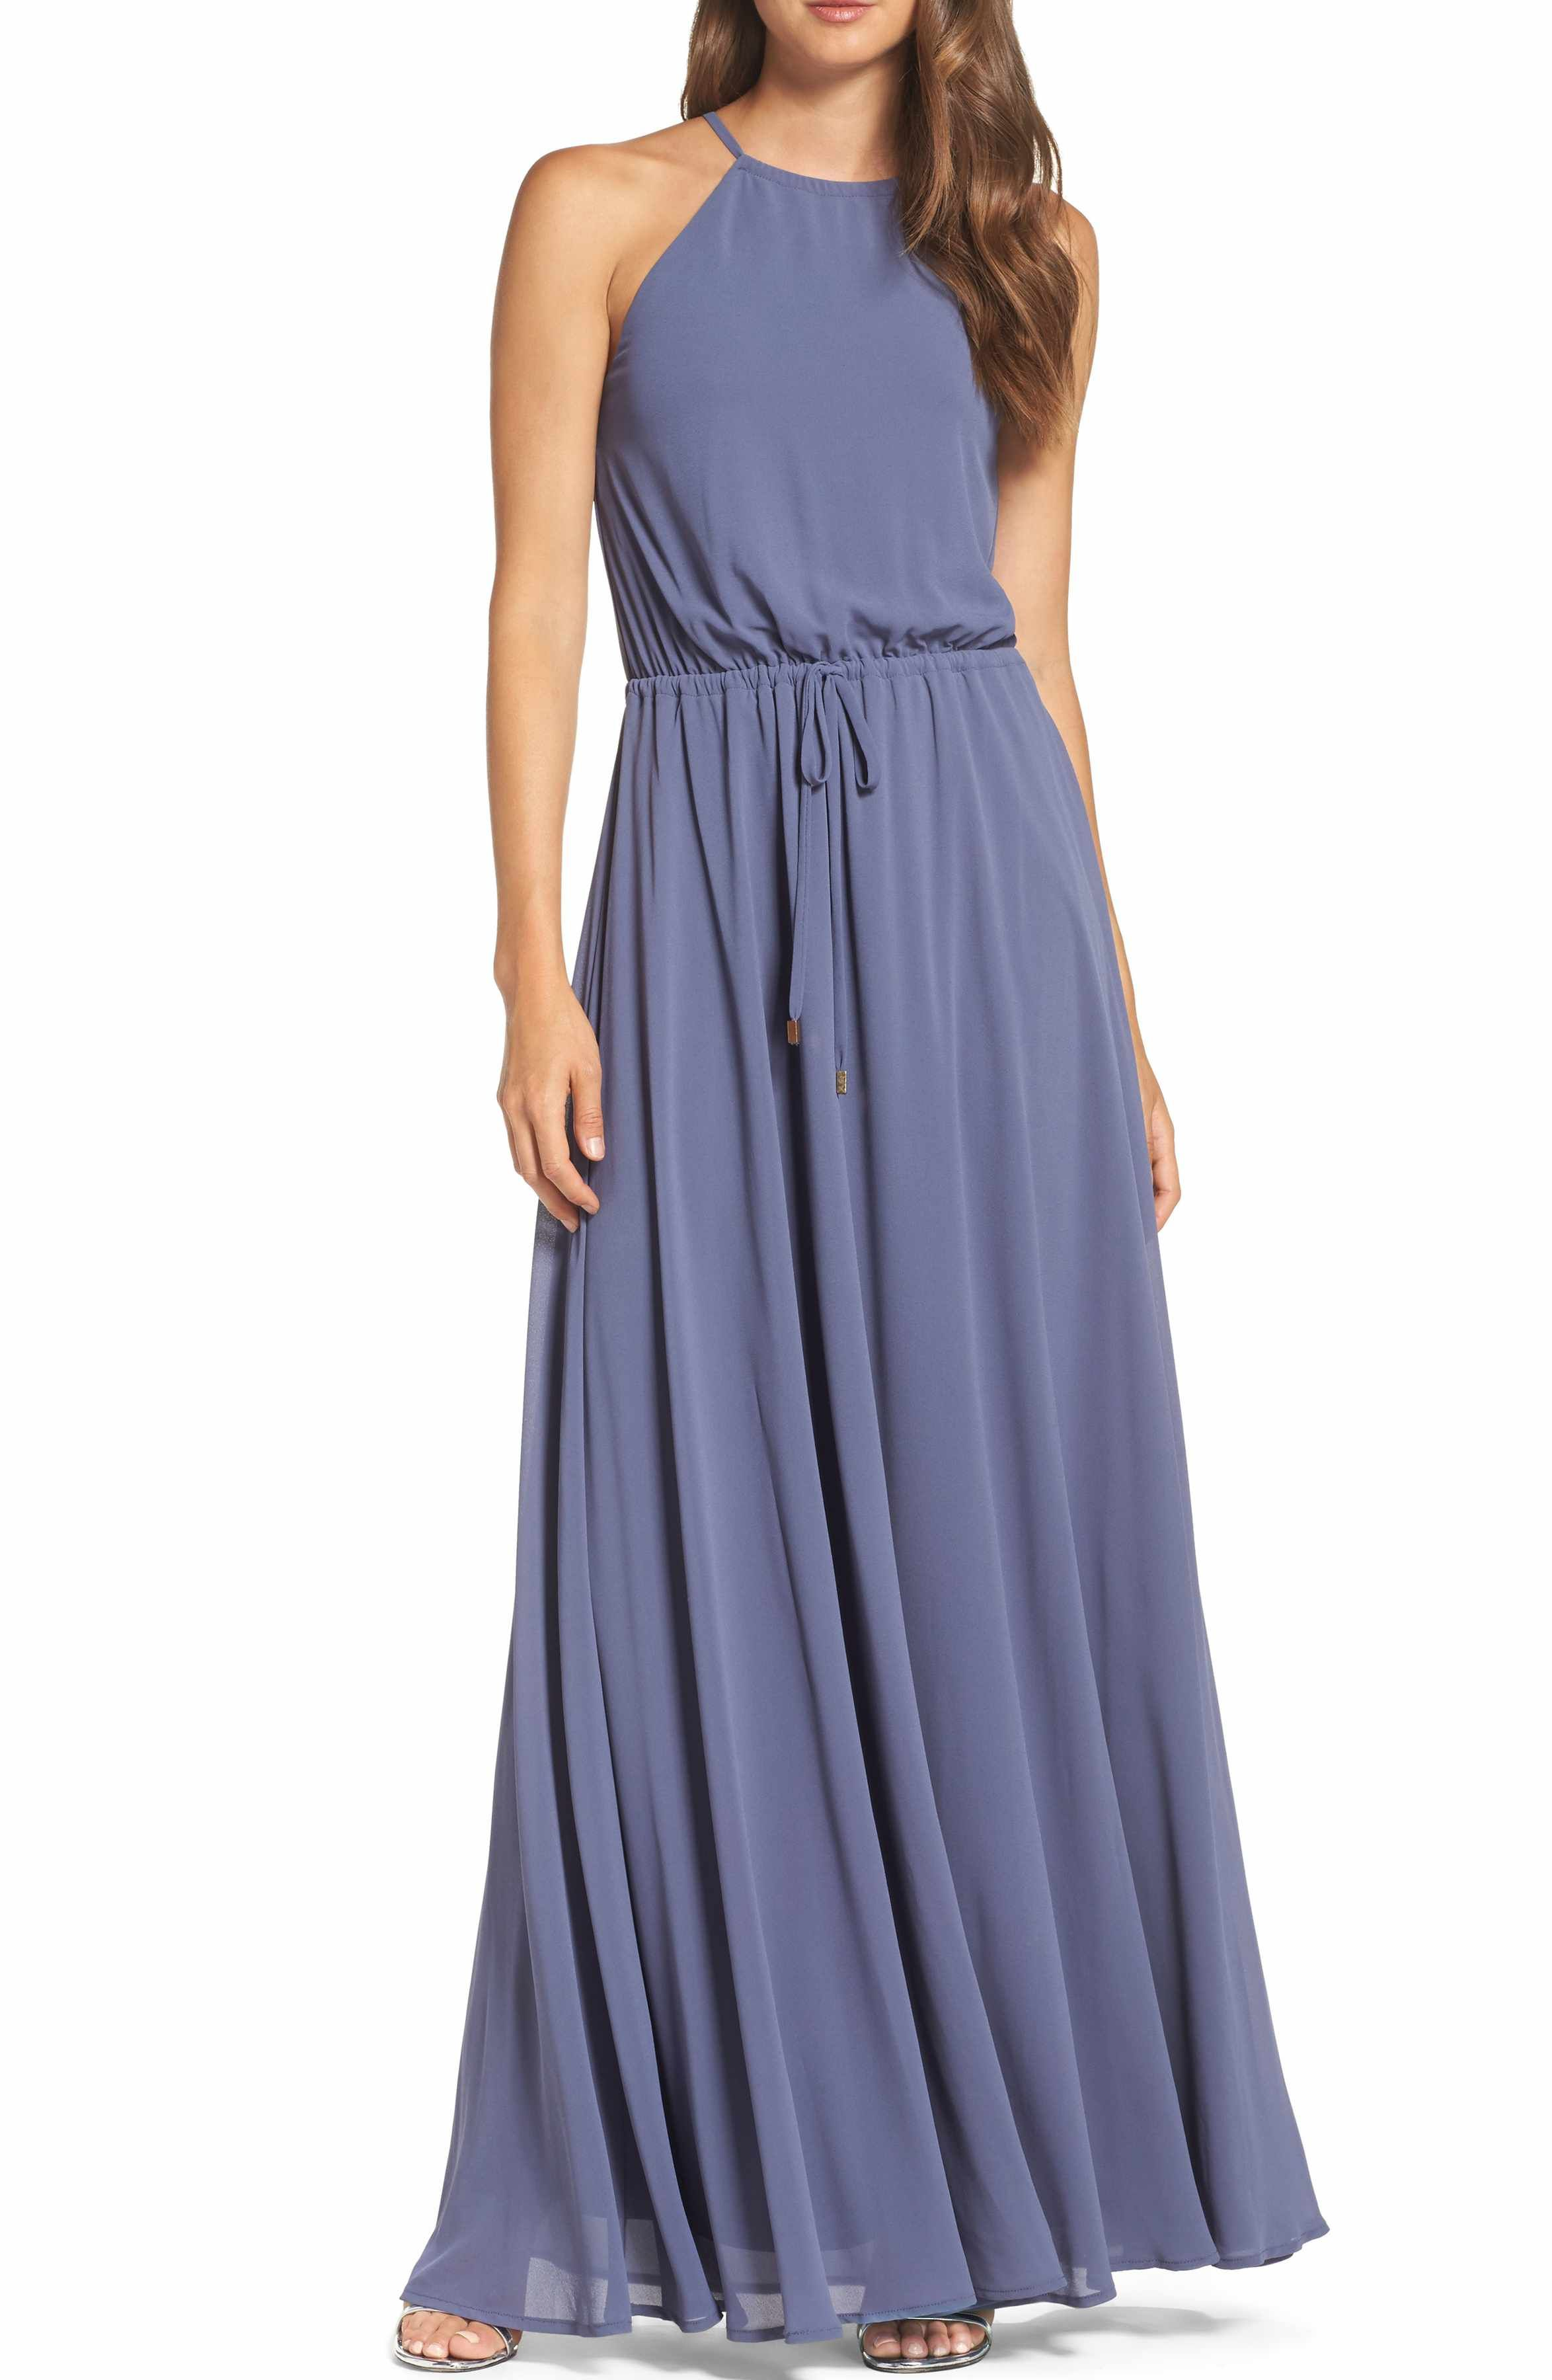 Lulus wedding guest dress  Lulus Be Mellow Cutaway Shoulder Chiffon Gown in Denim Blue